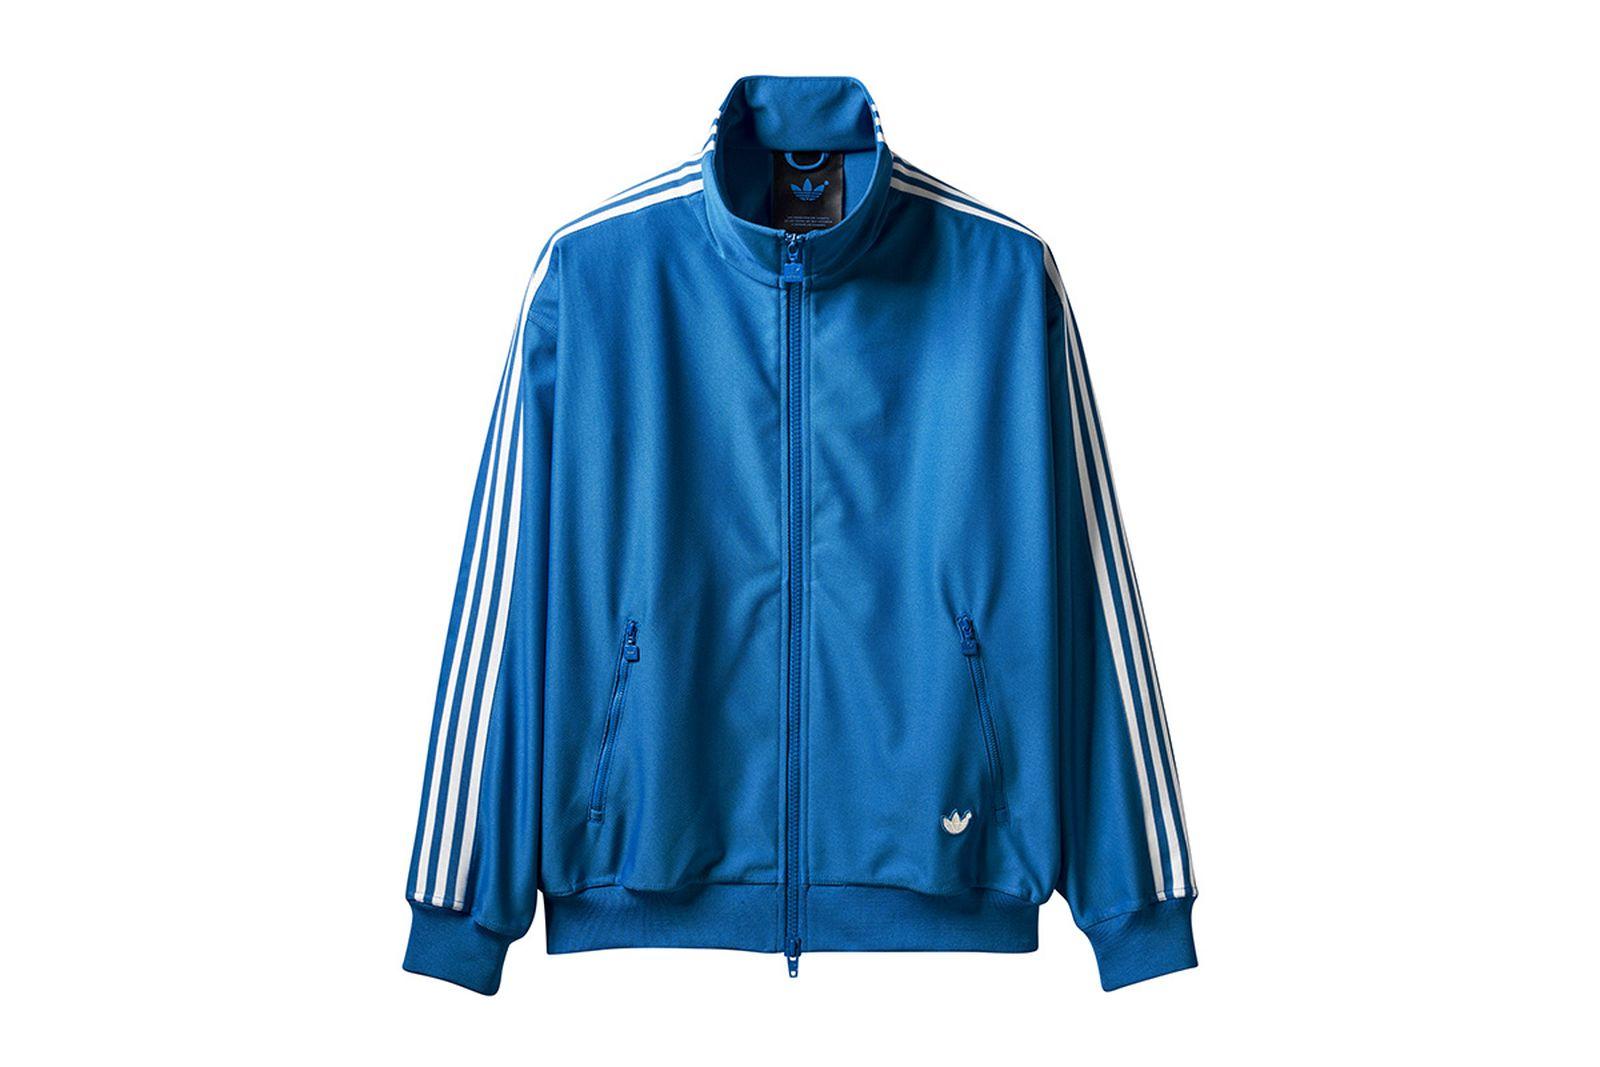 adidas-originals-blue-version-release-info-27